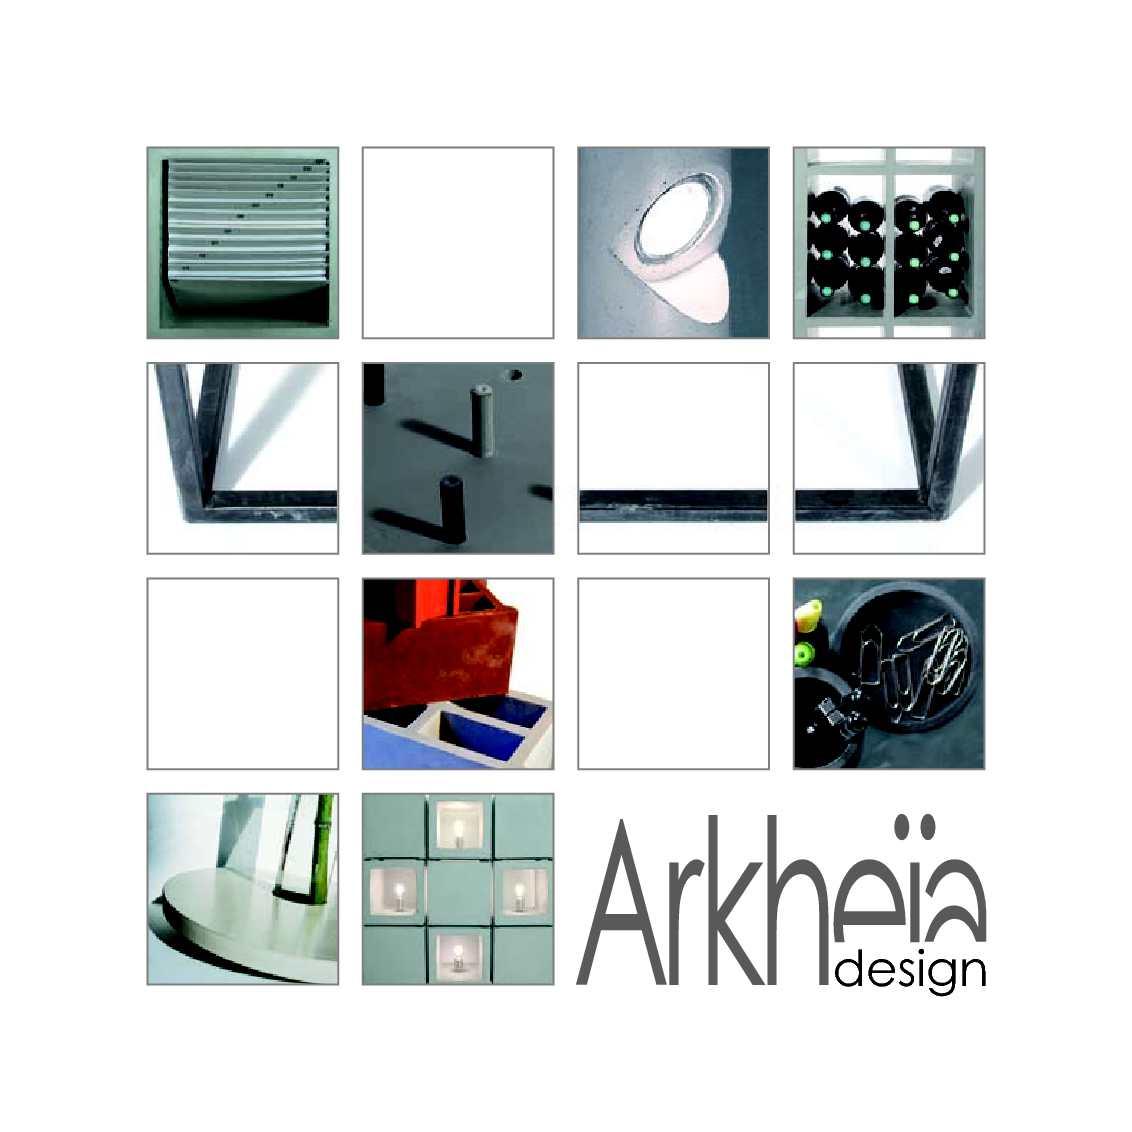 calam o catalogue objet design b ton arkheia. Black Bedroom Furniture Sets. Home Design Ideas